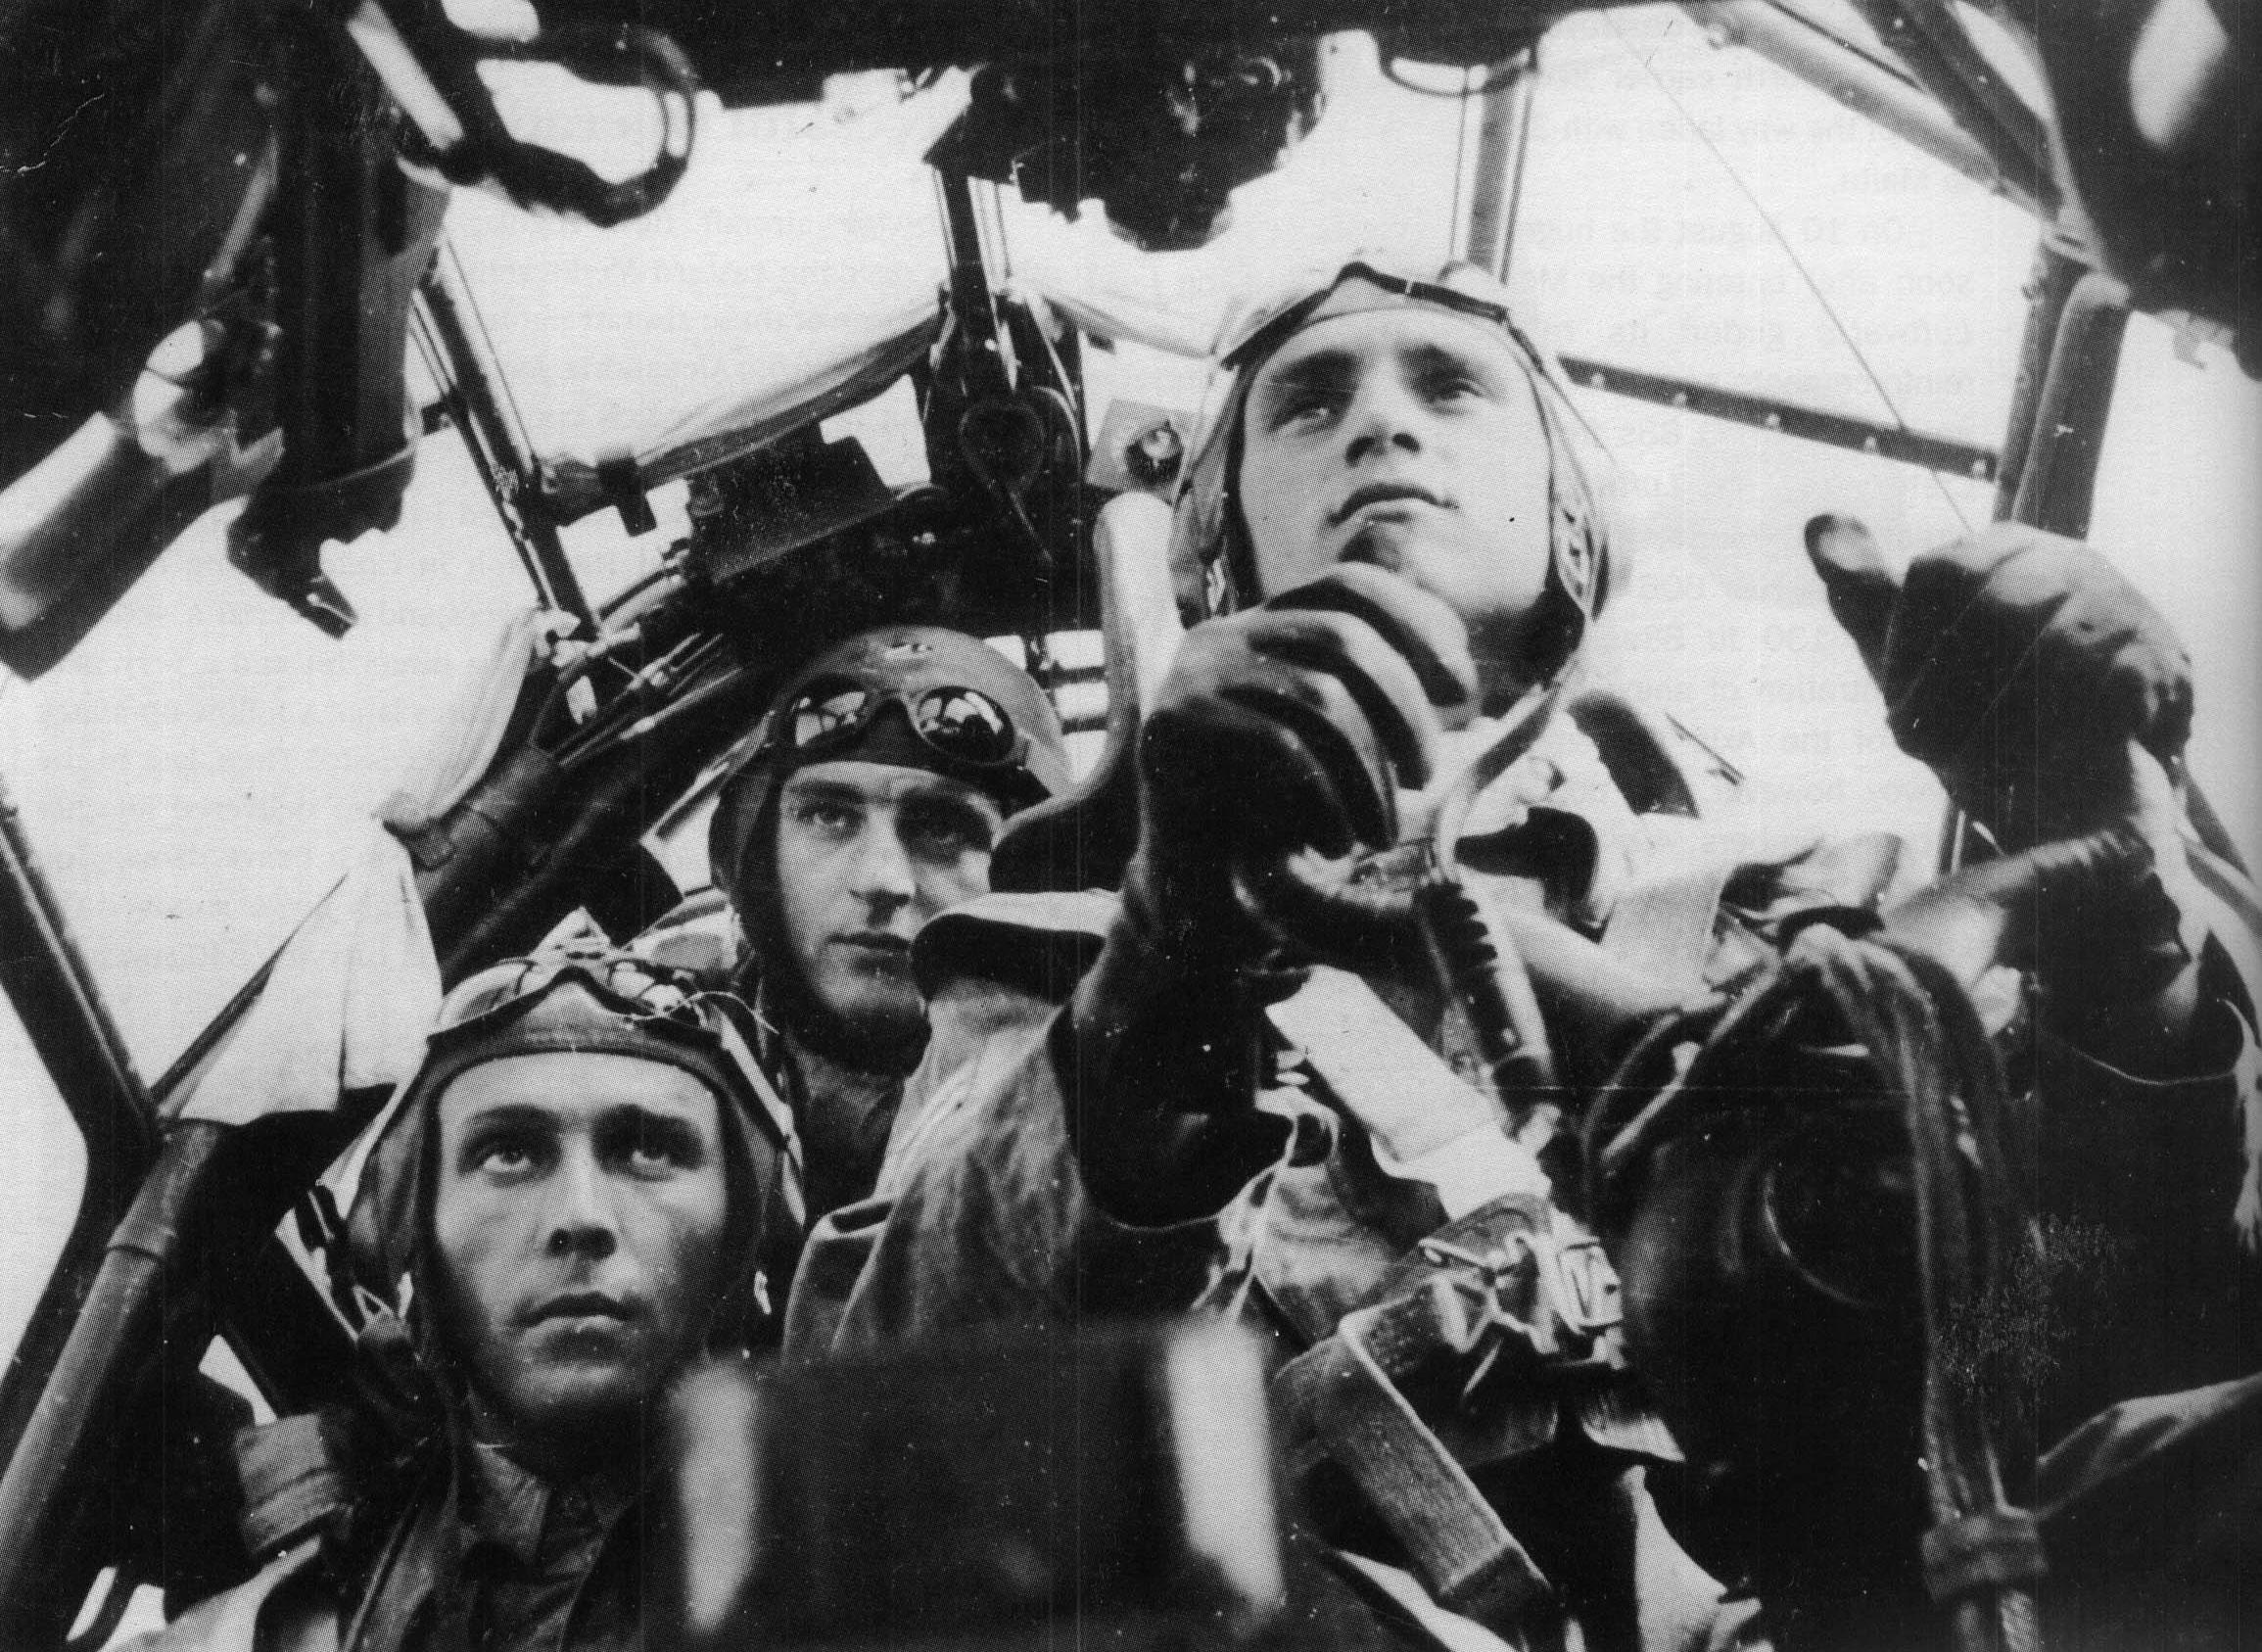 Junkers-Ju-88-crew-compartment-01.jpg